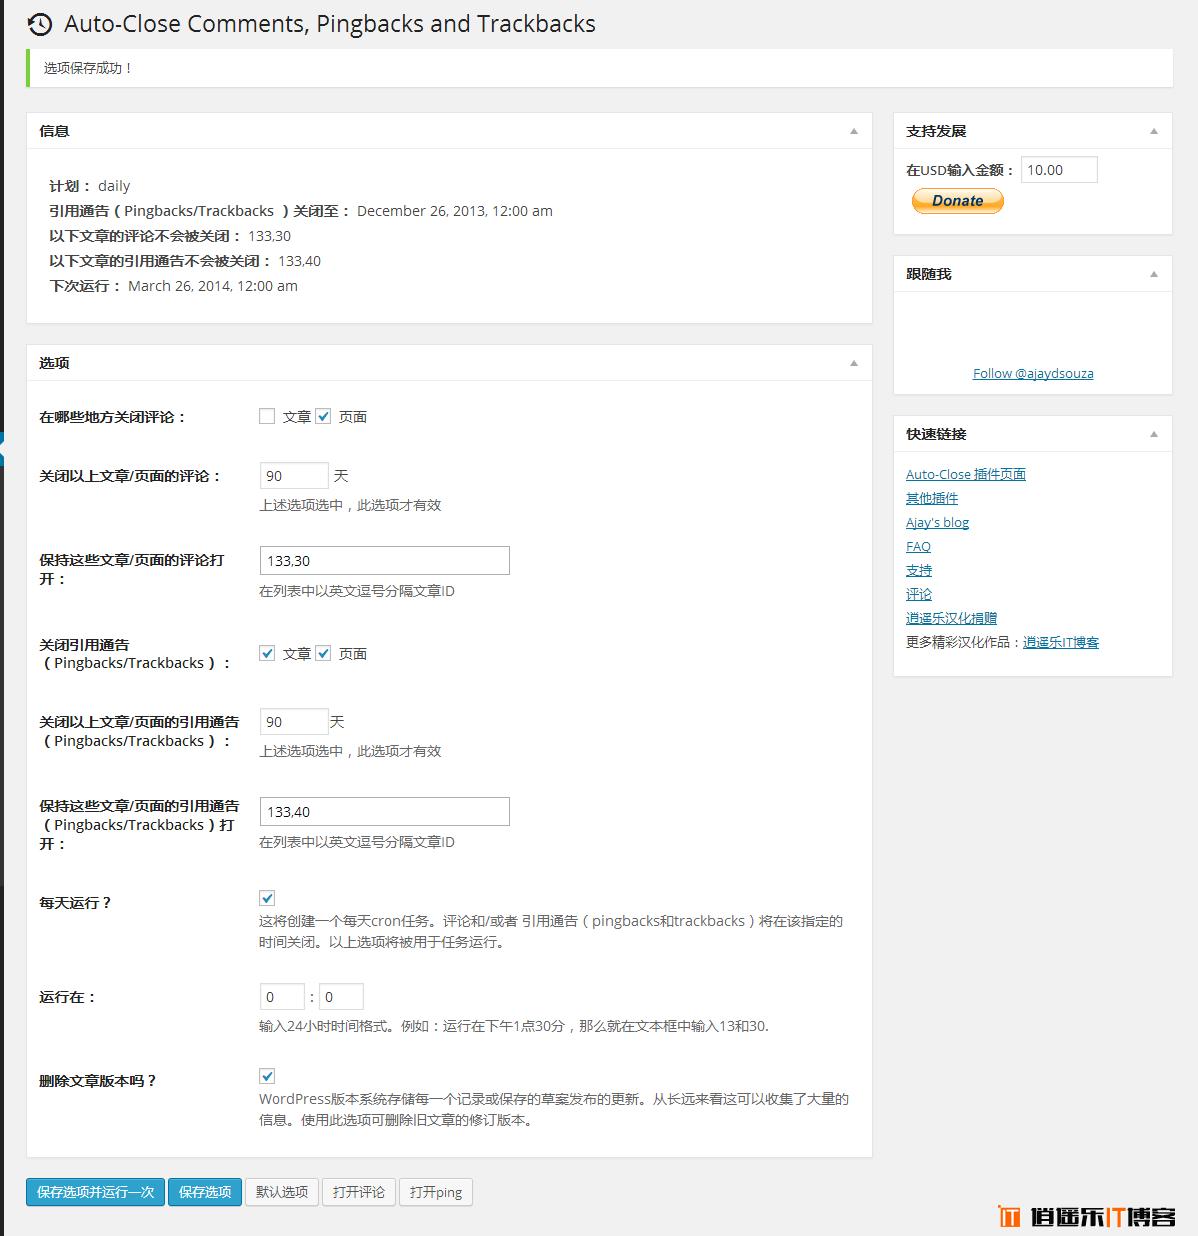 WordPress自动定时关闭评论、引用通告插件:Auto-Close逍遥乐汉化免费下载